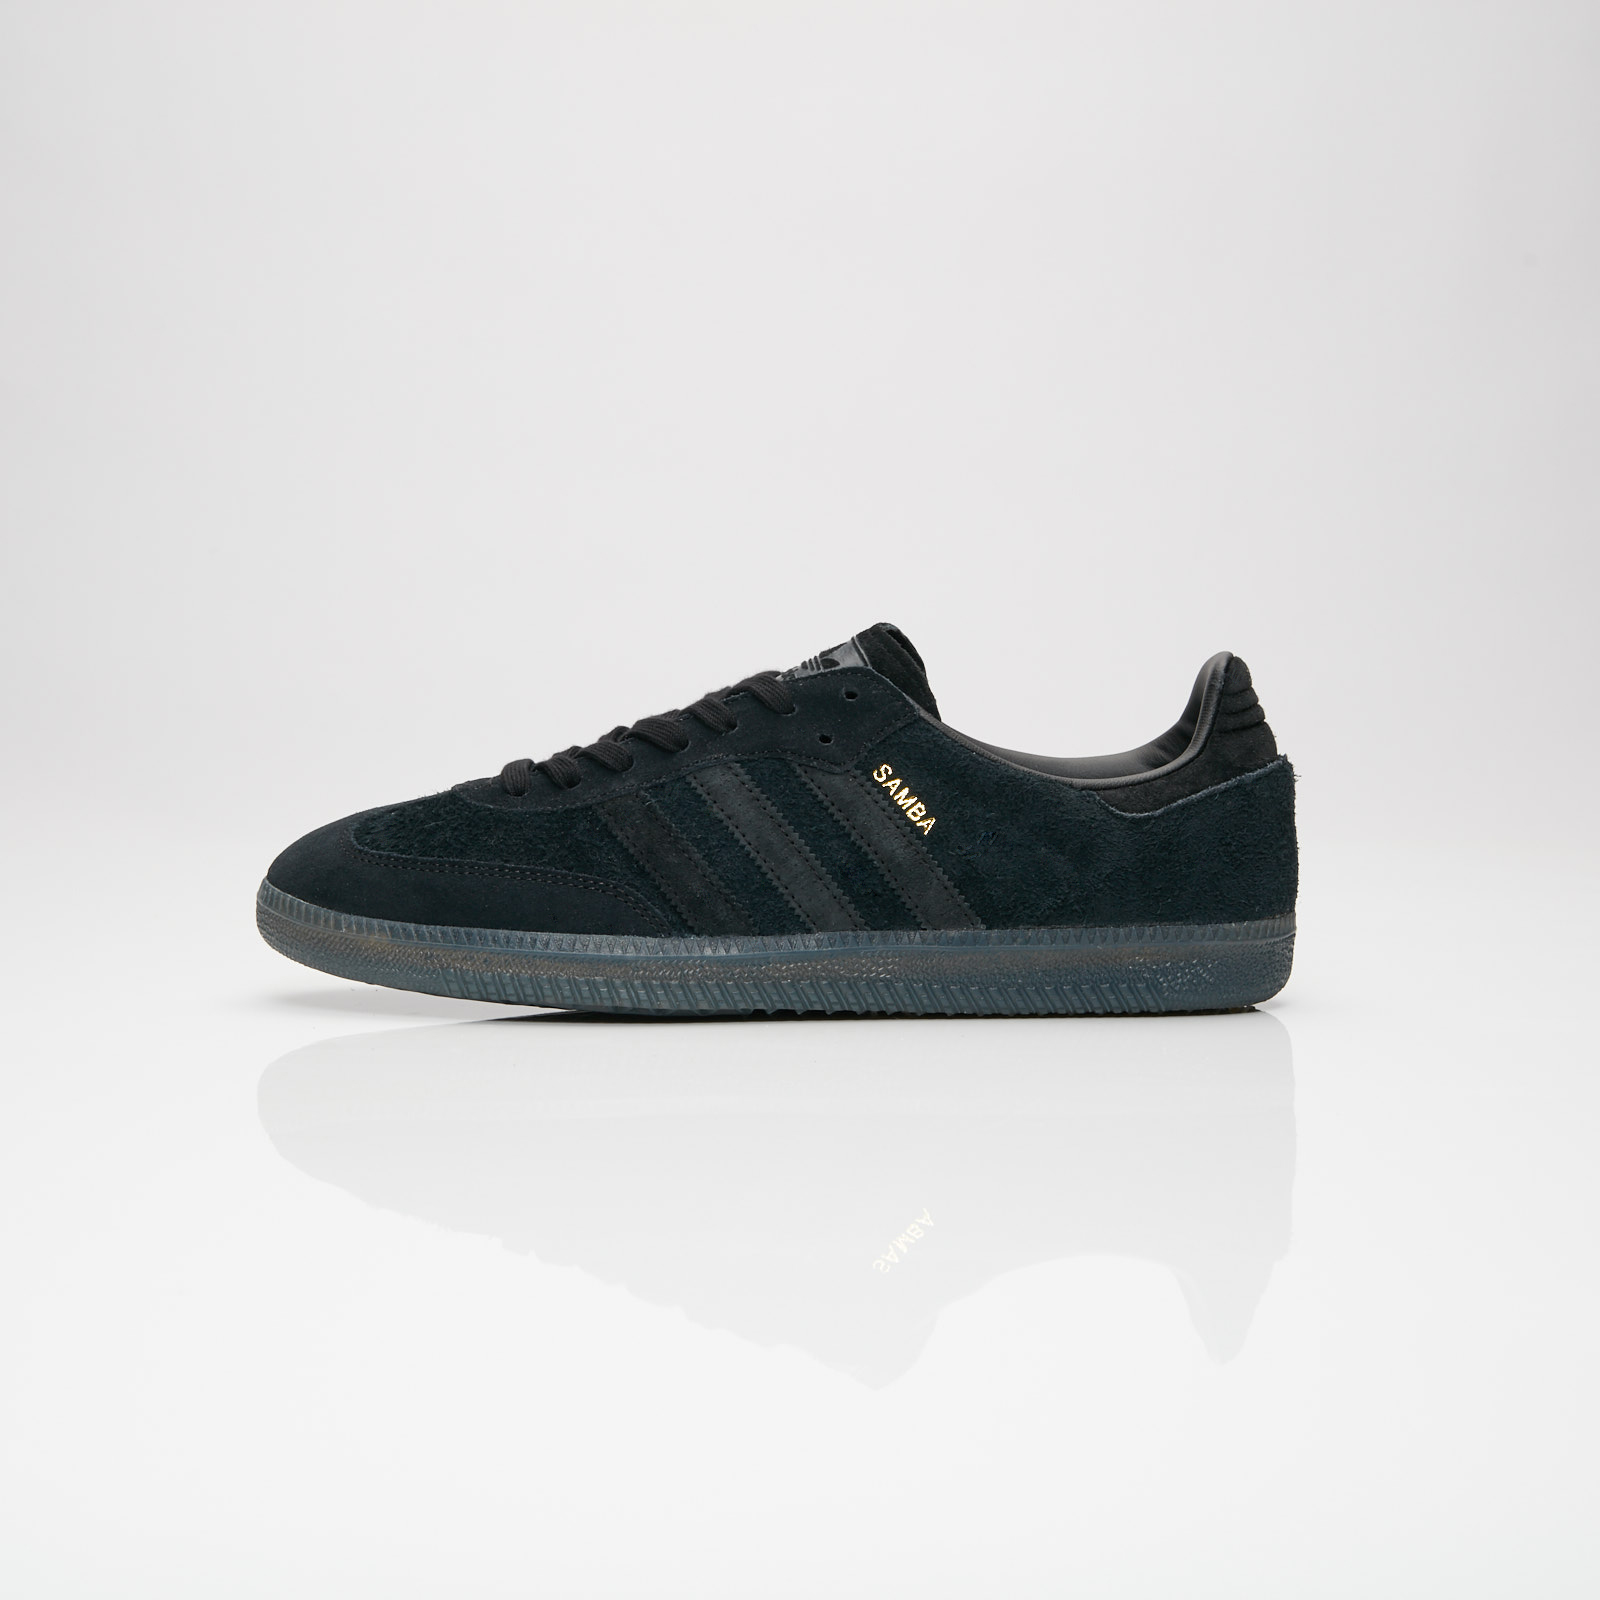 e80e0812d821 adidas Samba OG - B75682 - Sneakersnstuff